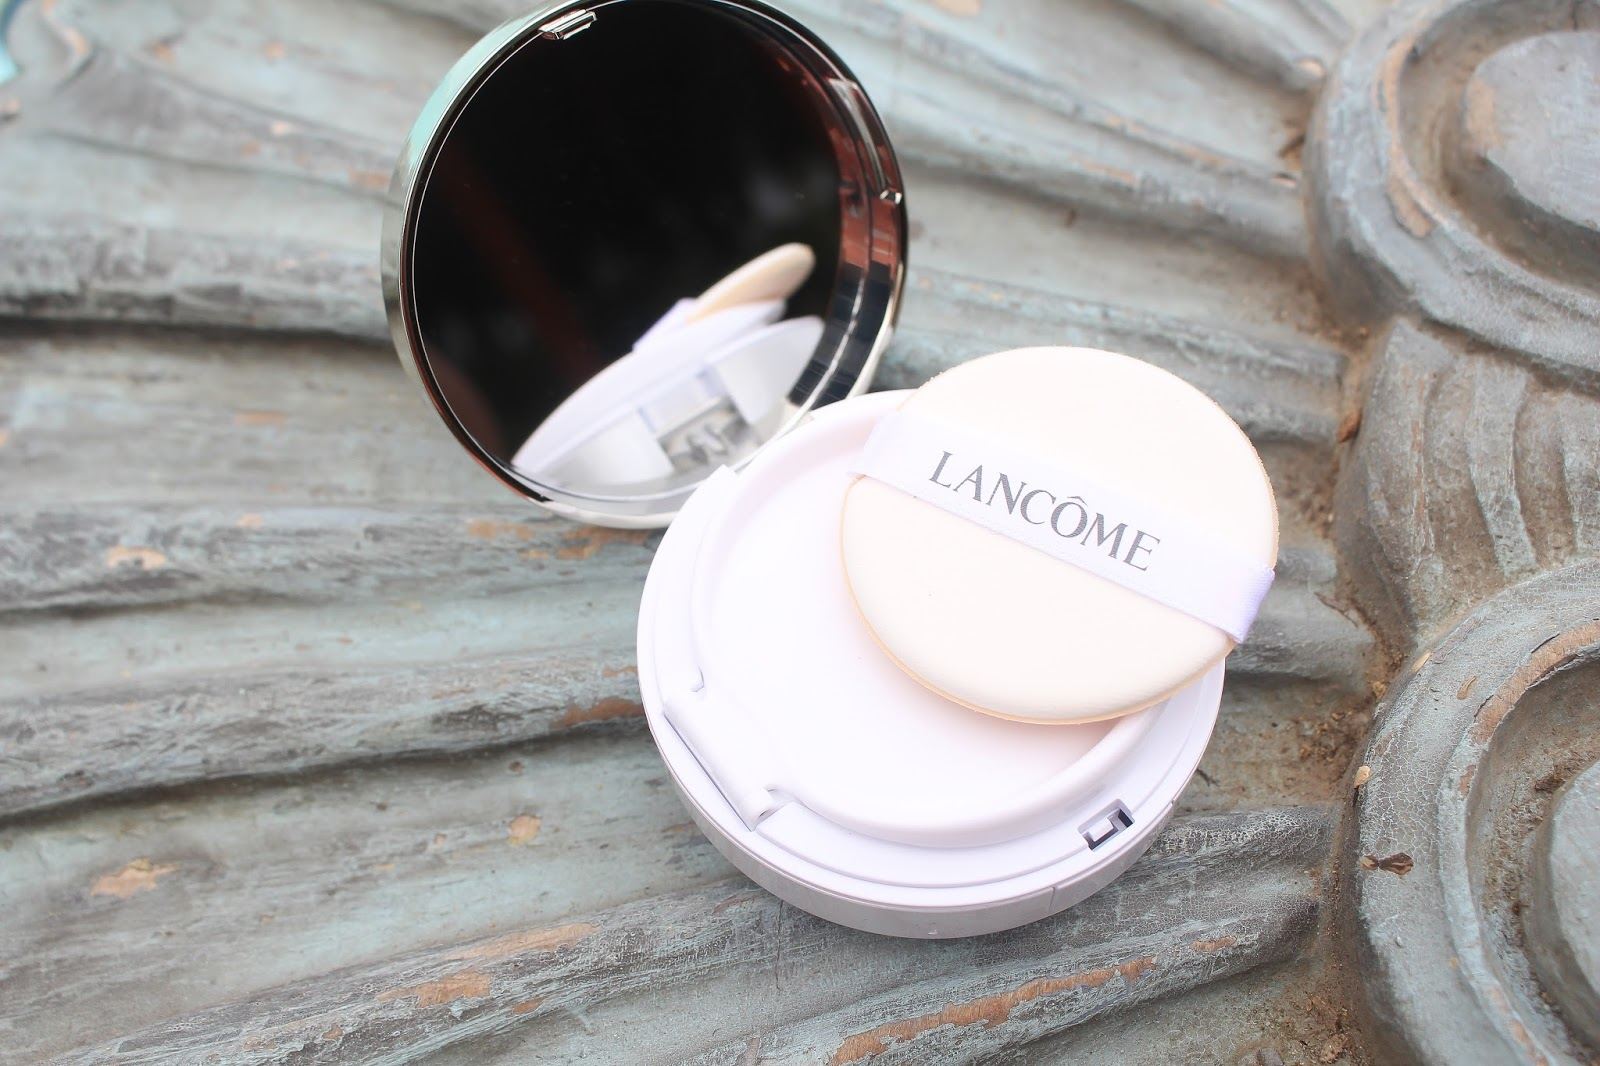 Lancôme Miracle Cushion Foundation Packaging